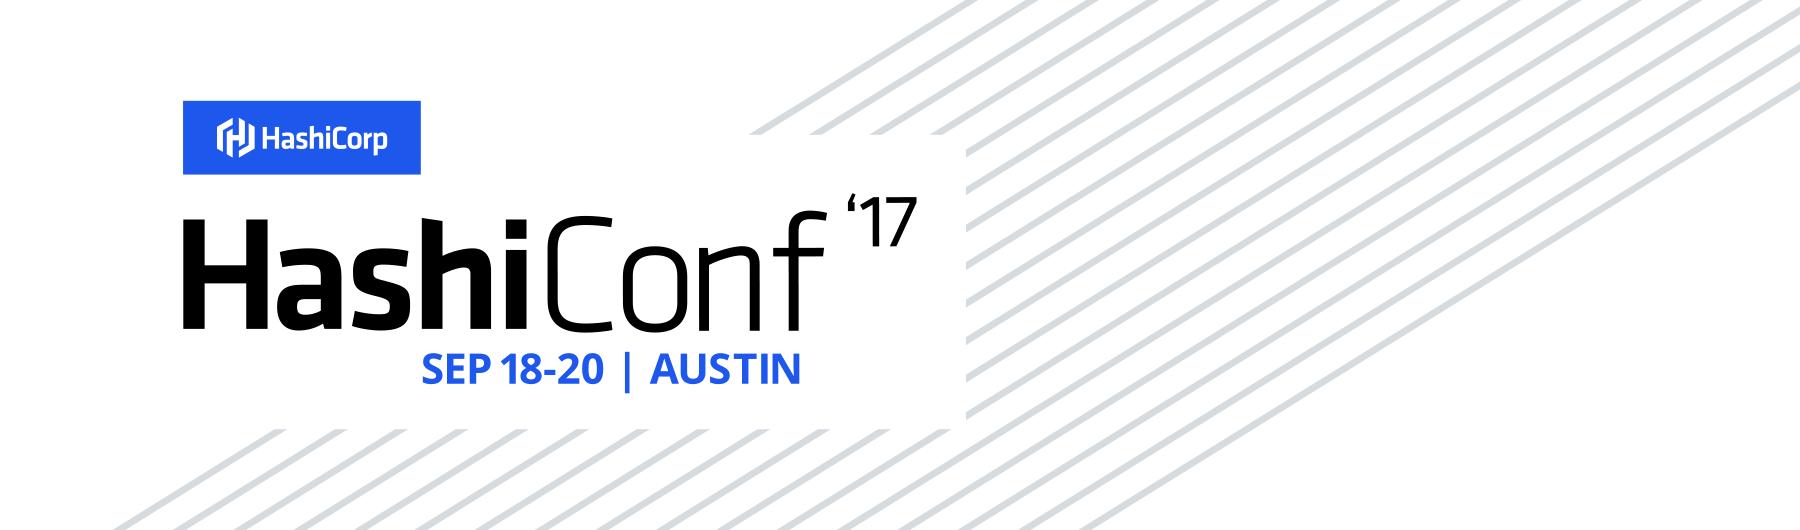 HashiConf 2017